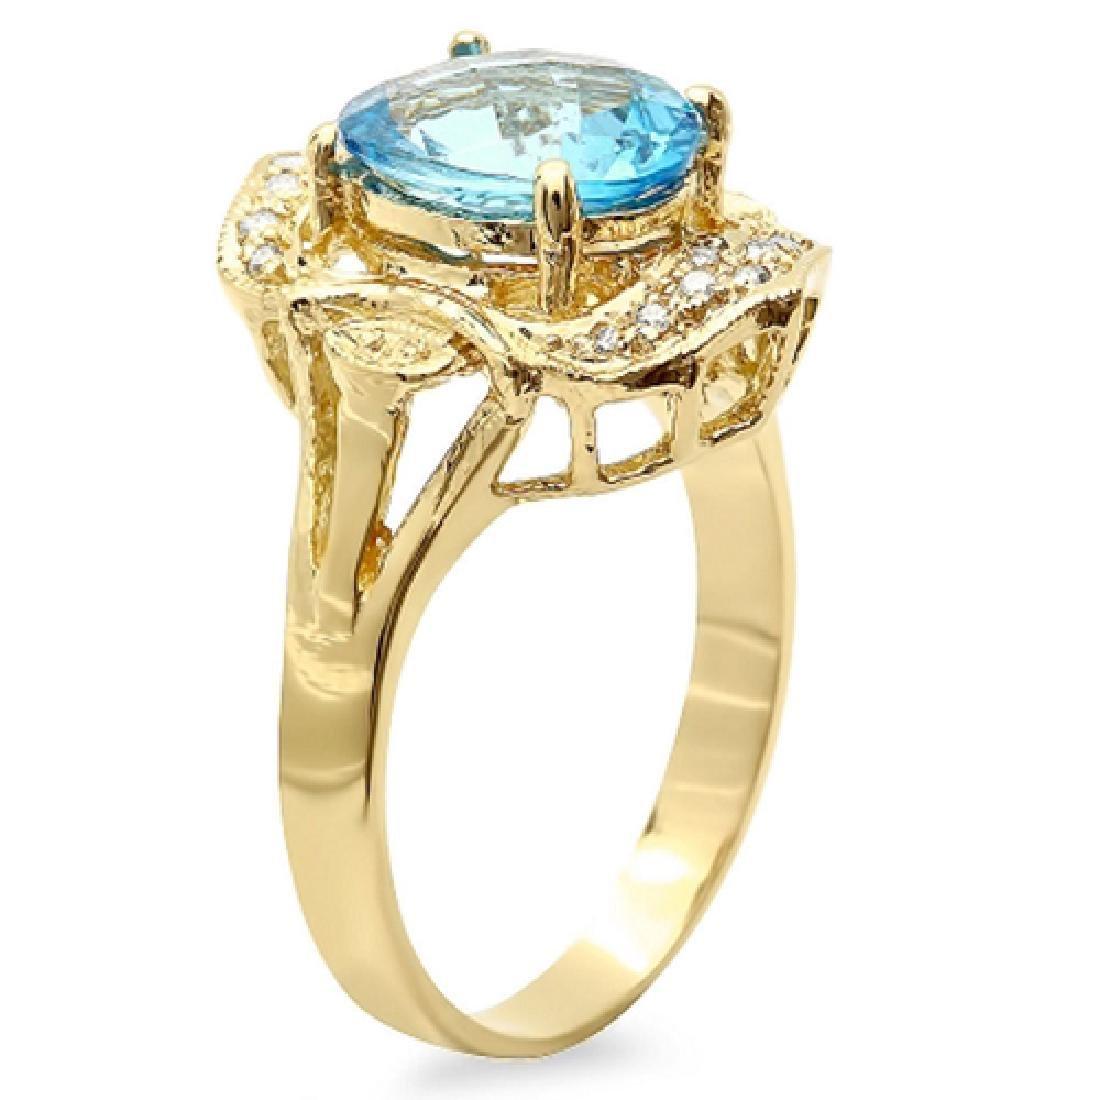 3.10 Carat Natural Topaz 18K Solid Yellow Gold Diamond - 2